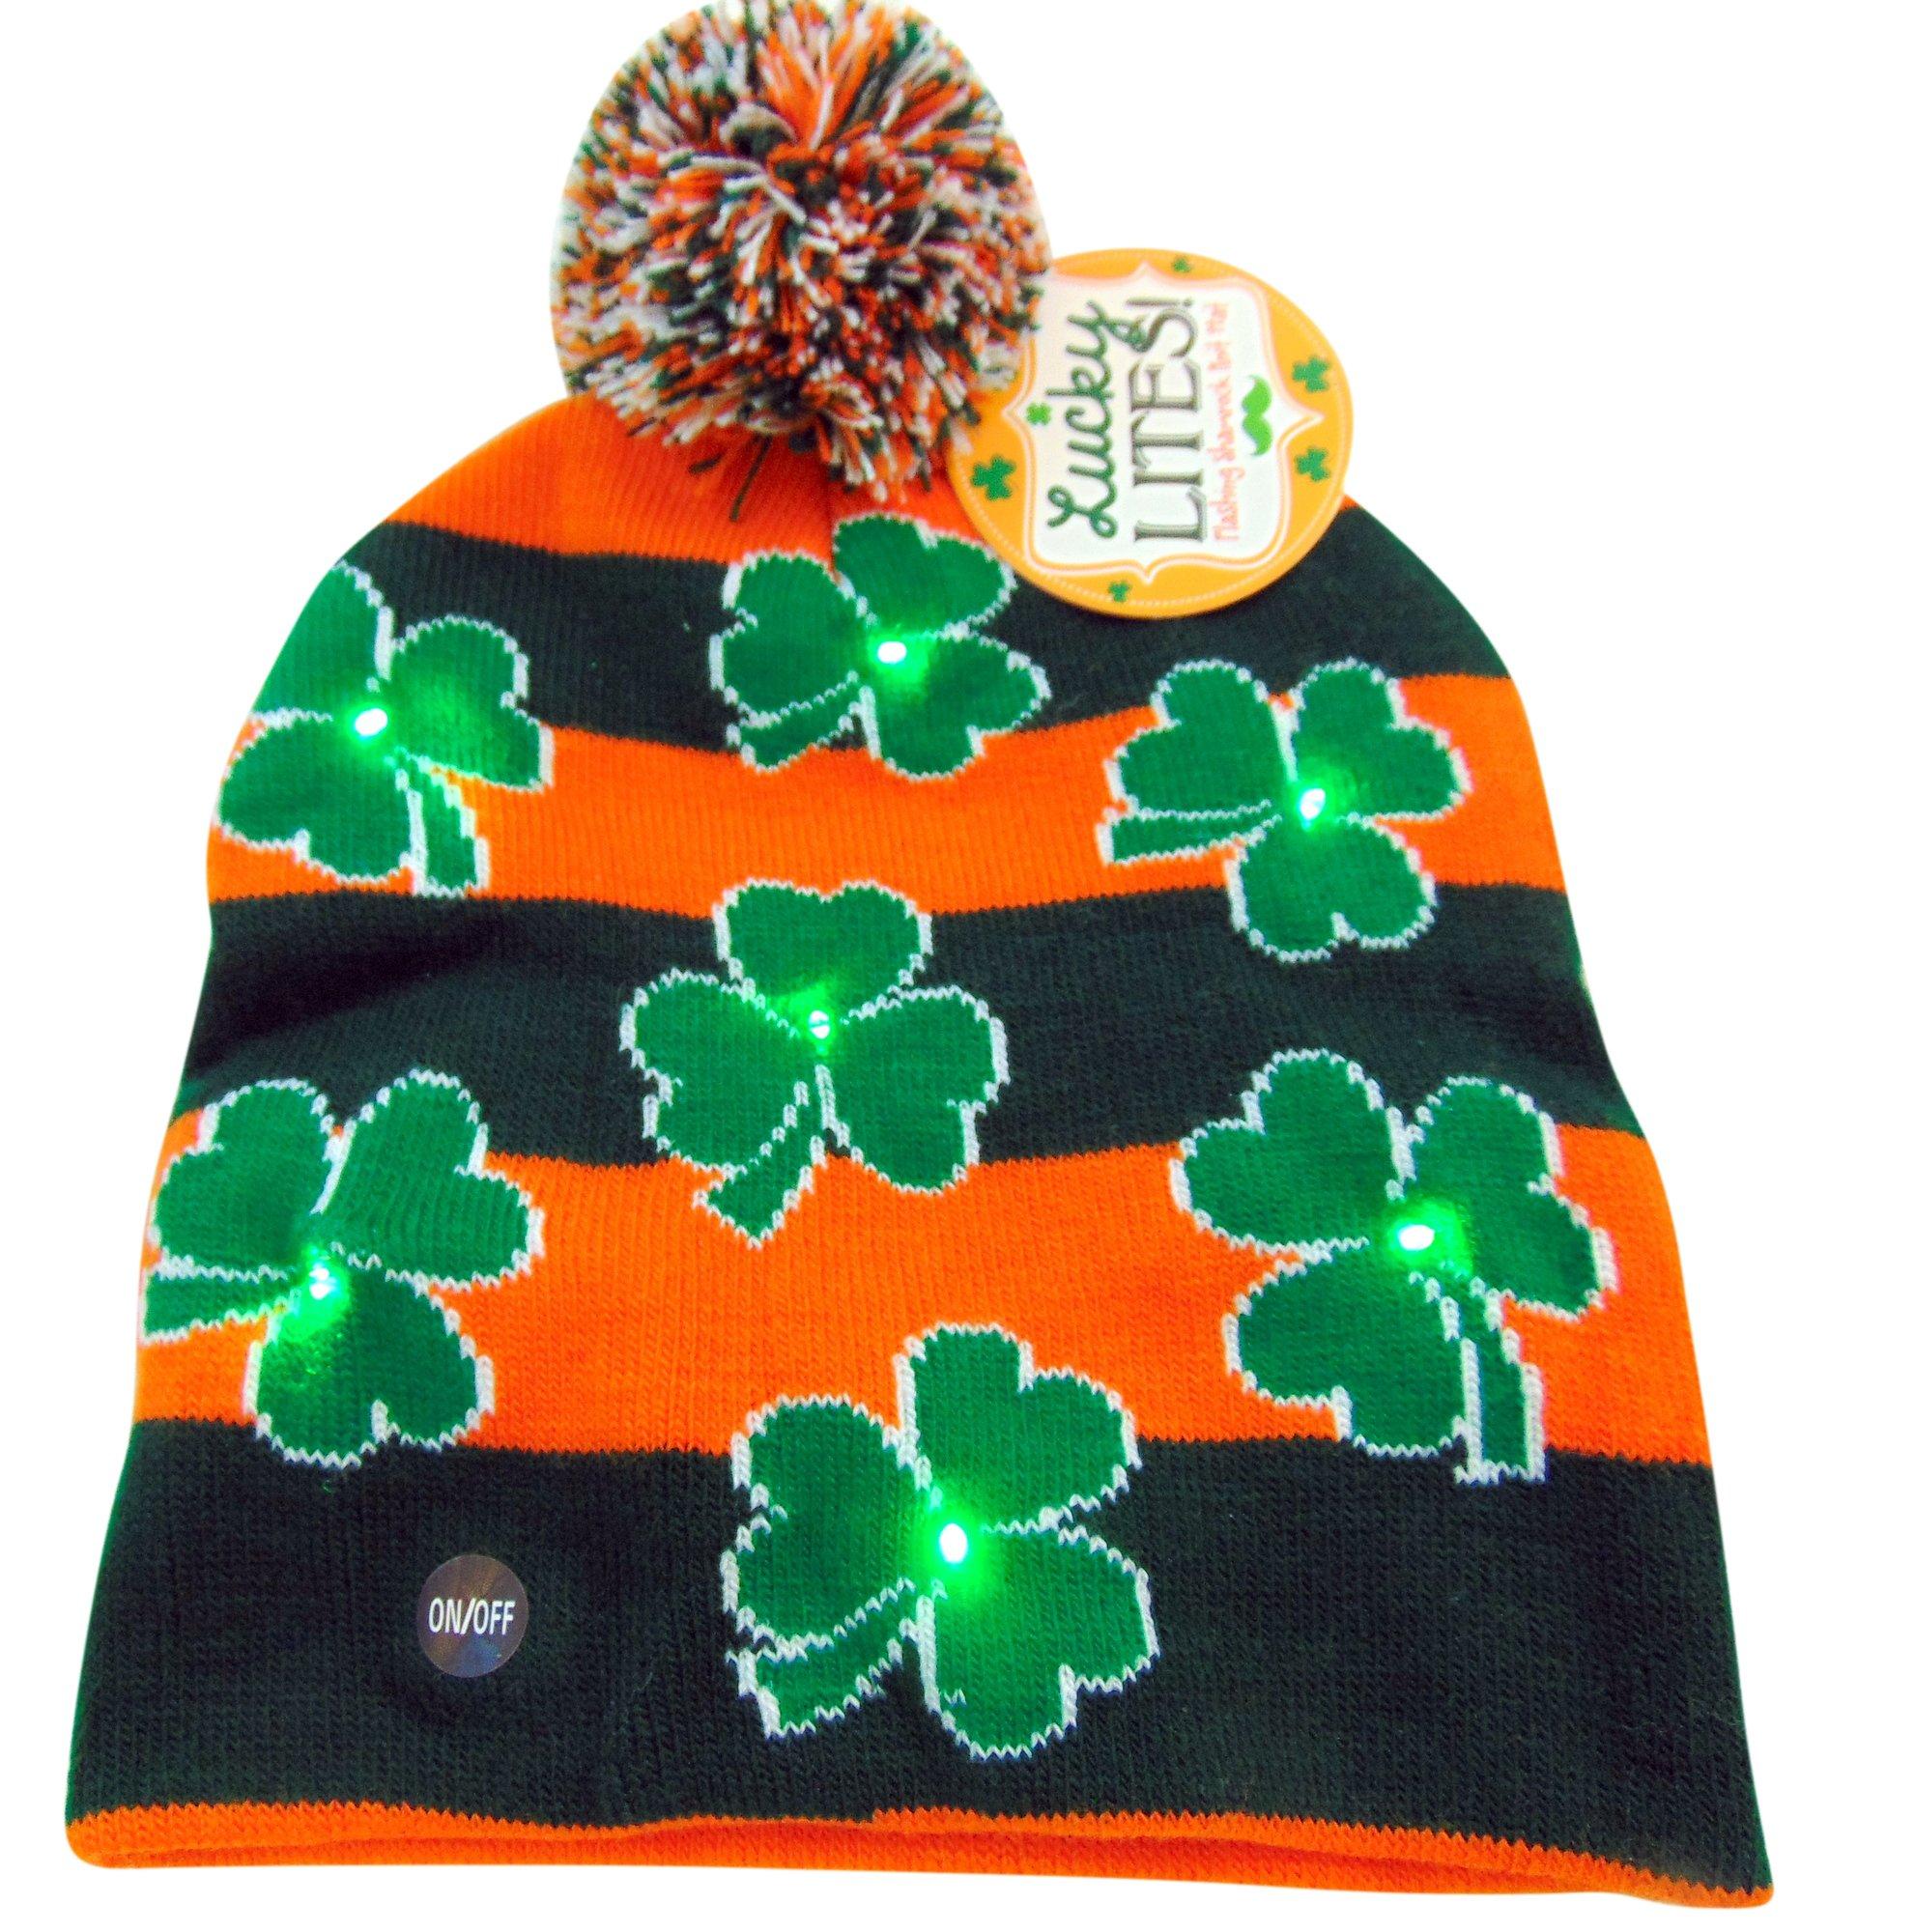 ecb54aaed56ee9 DM Imports ST Patricks Day Irish Light Up Beanie Skull Cap With ...